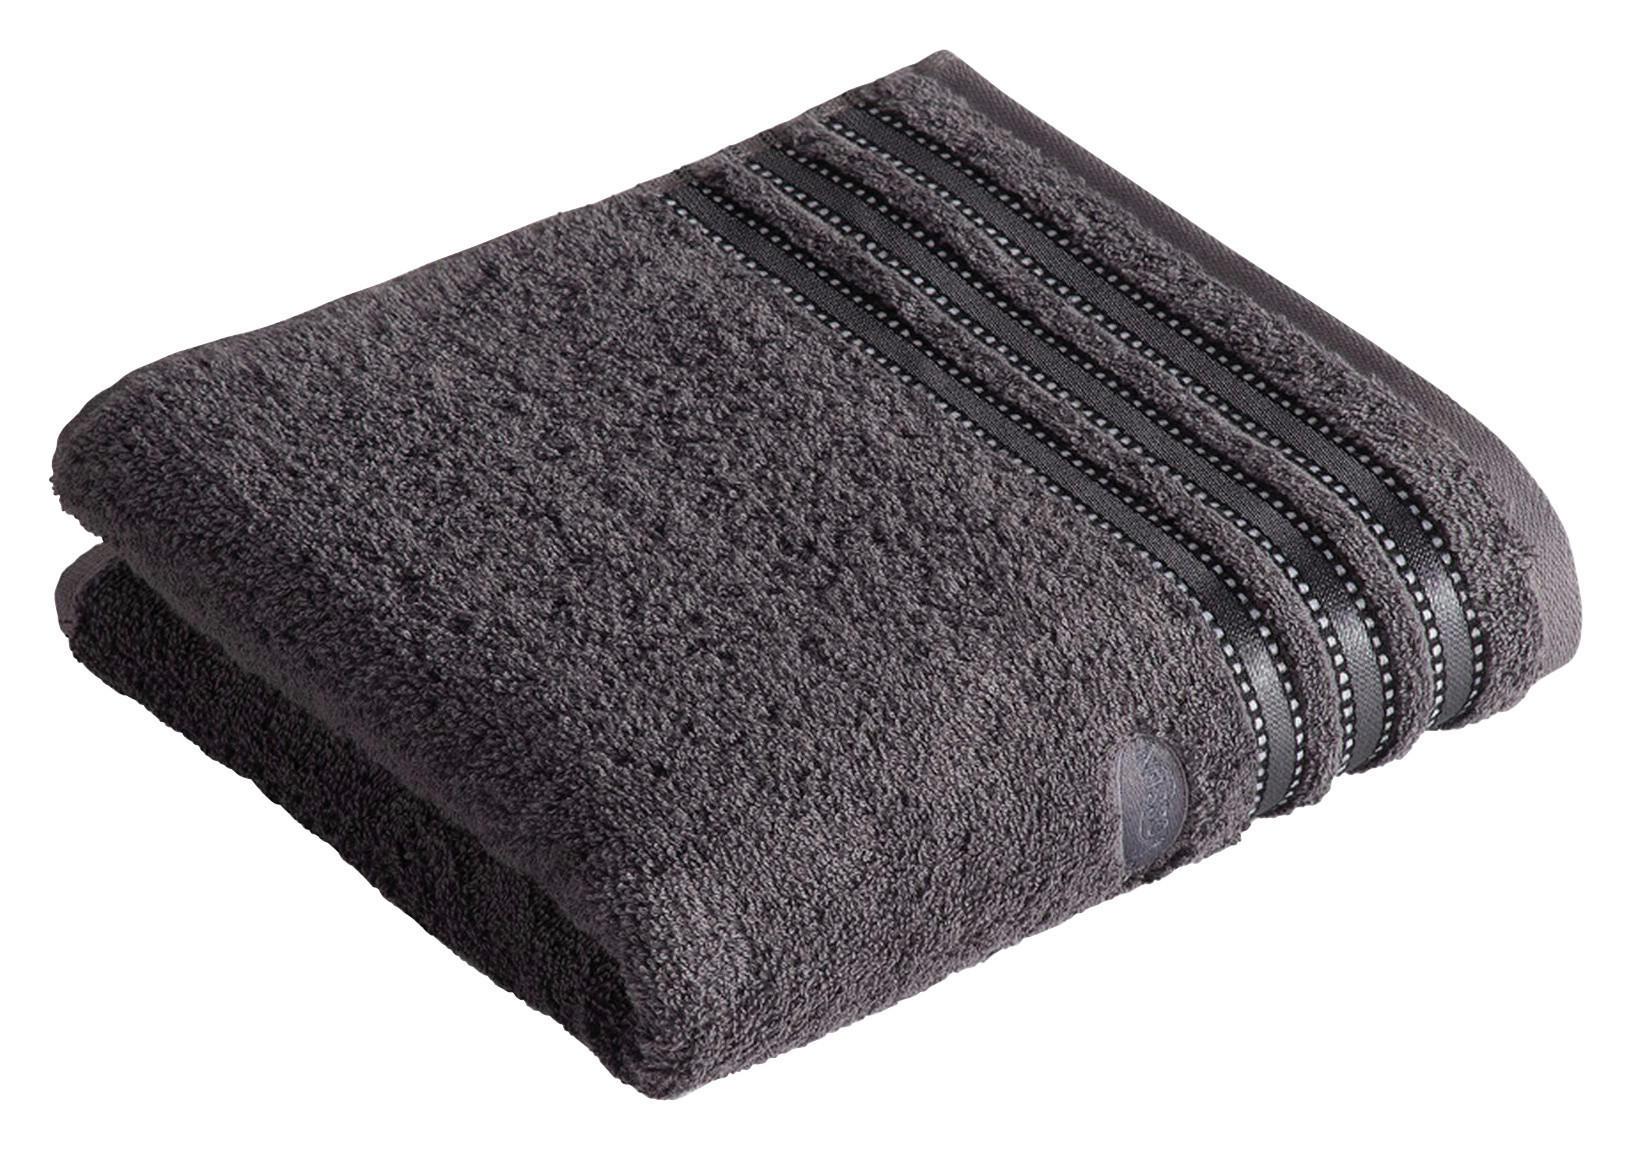 BRISAČA CULT DE LUXE, 50/100 - antracit, Konvencionalno, tekstil (50/100cm) - VOSSEN